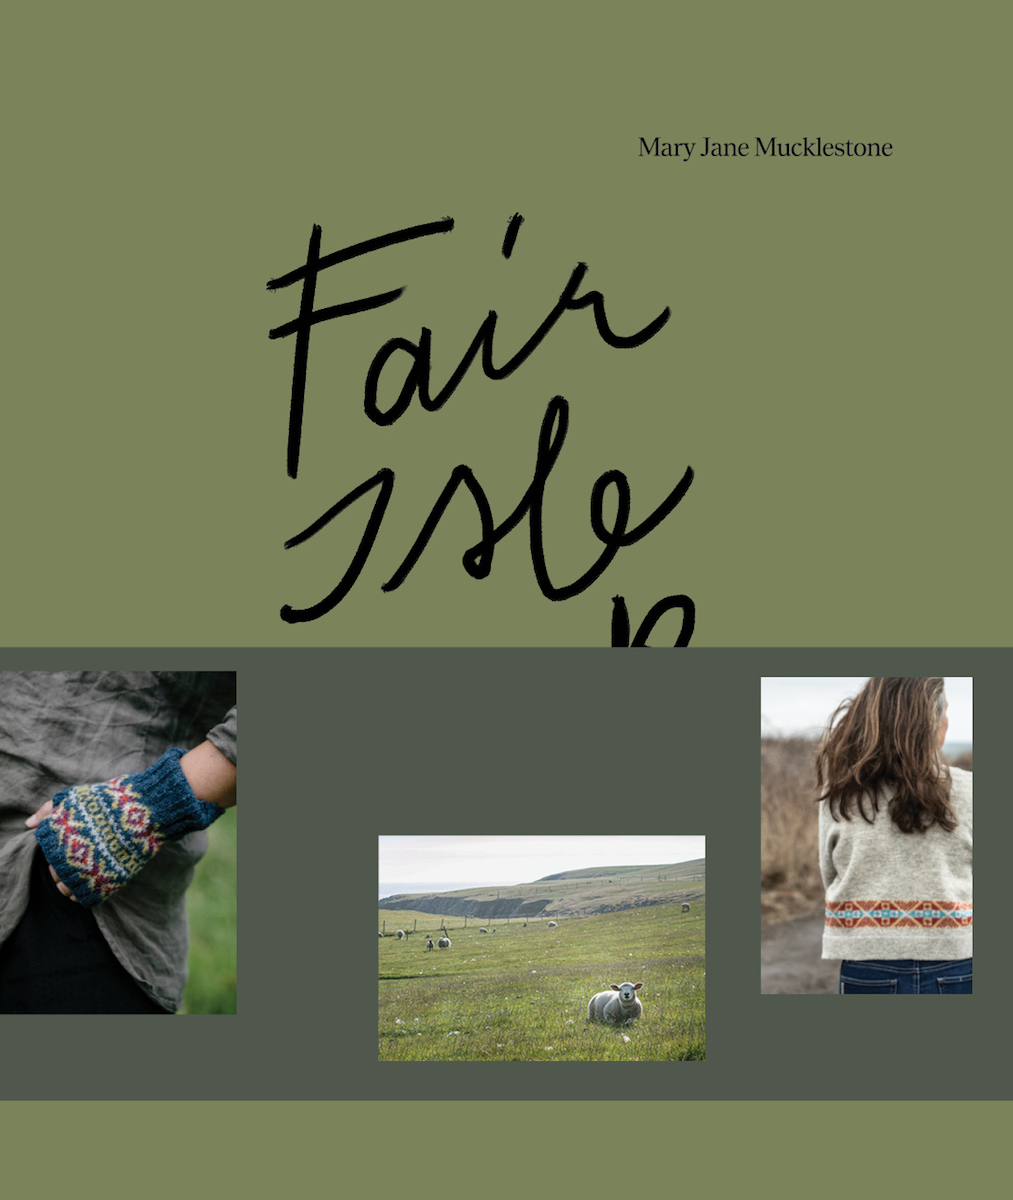 Fair Isle Weekend - Mary Jane Mucklestone SUOMI